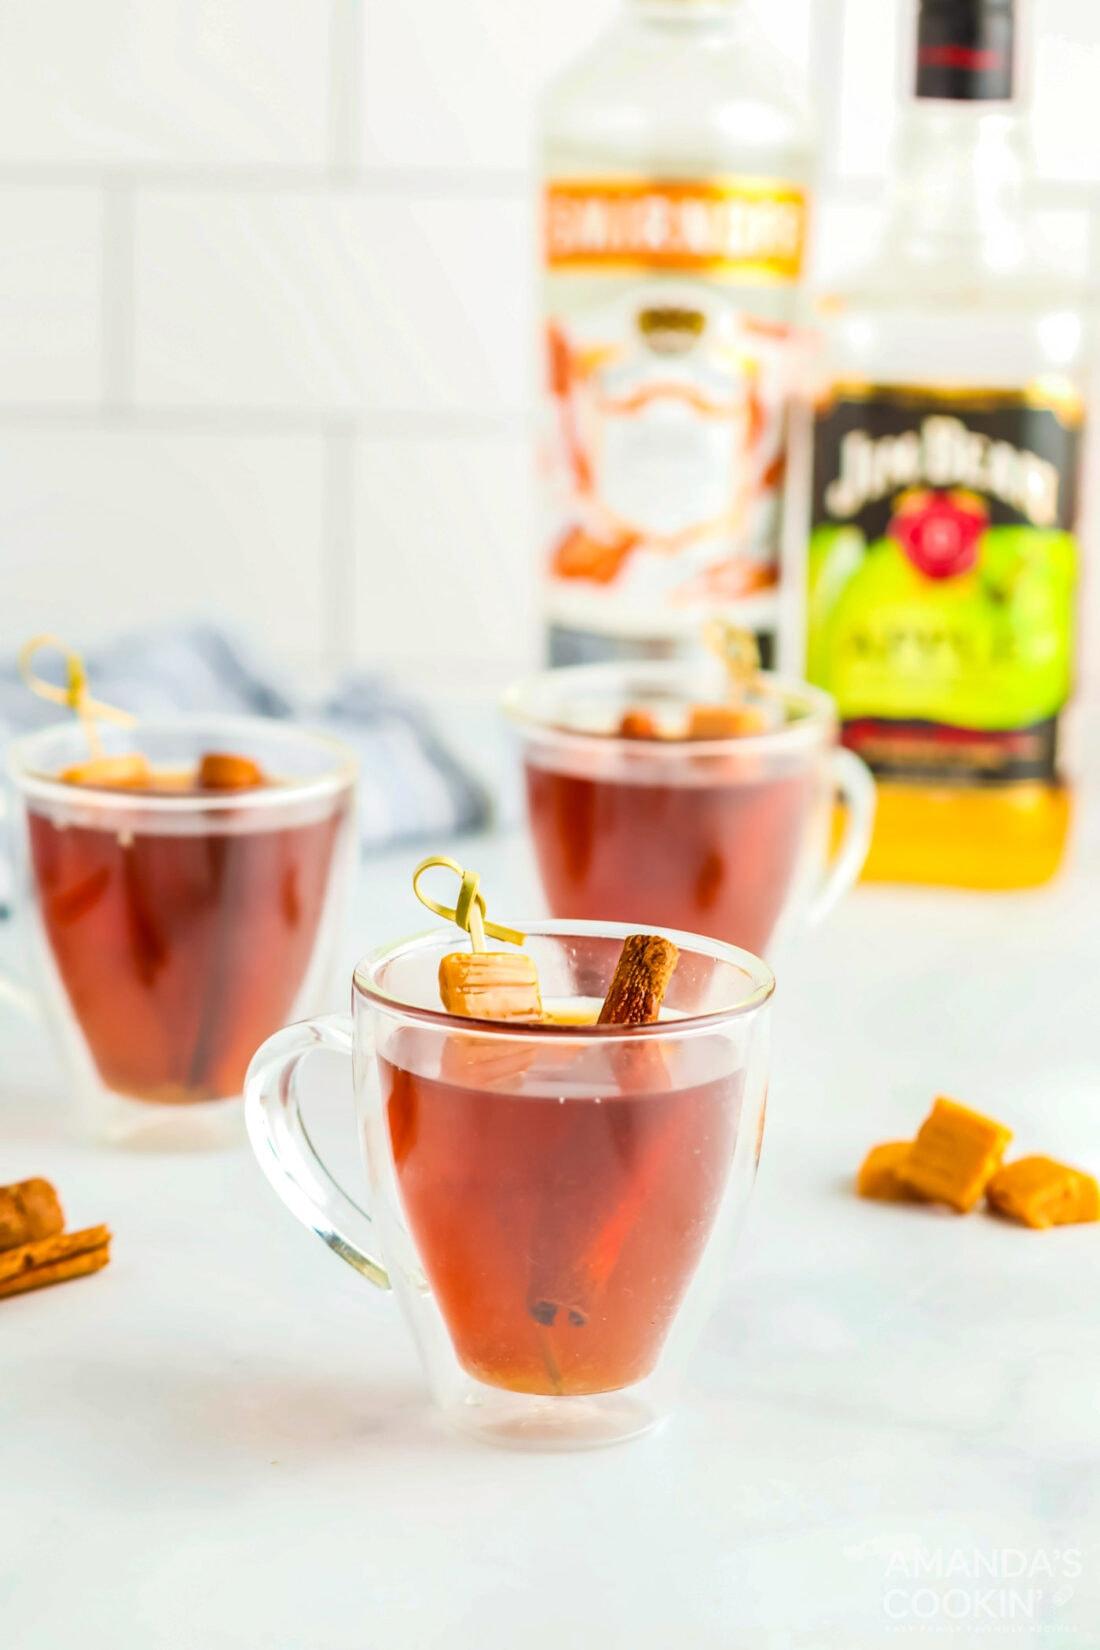 3 mugs of Spiked Caramel Apple Cider